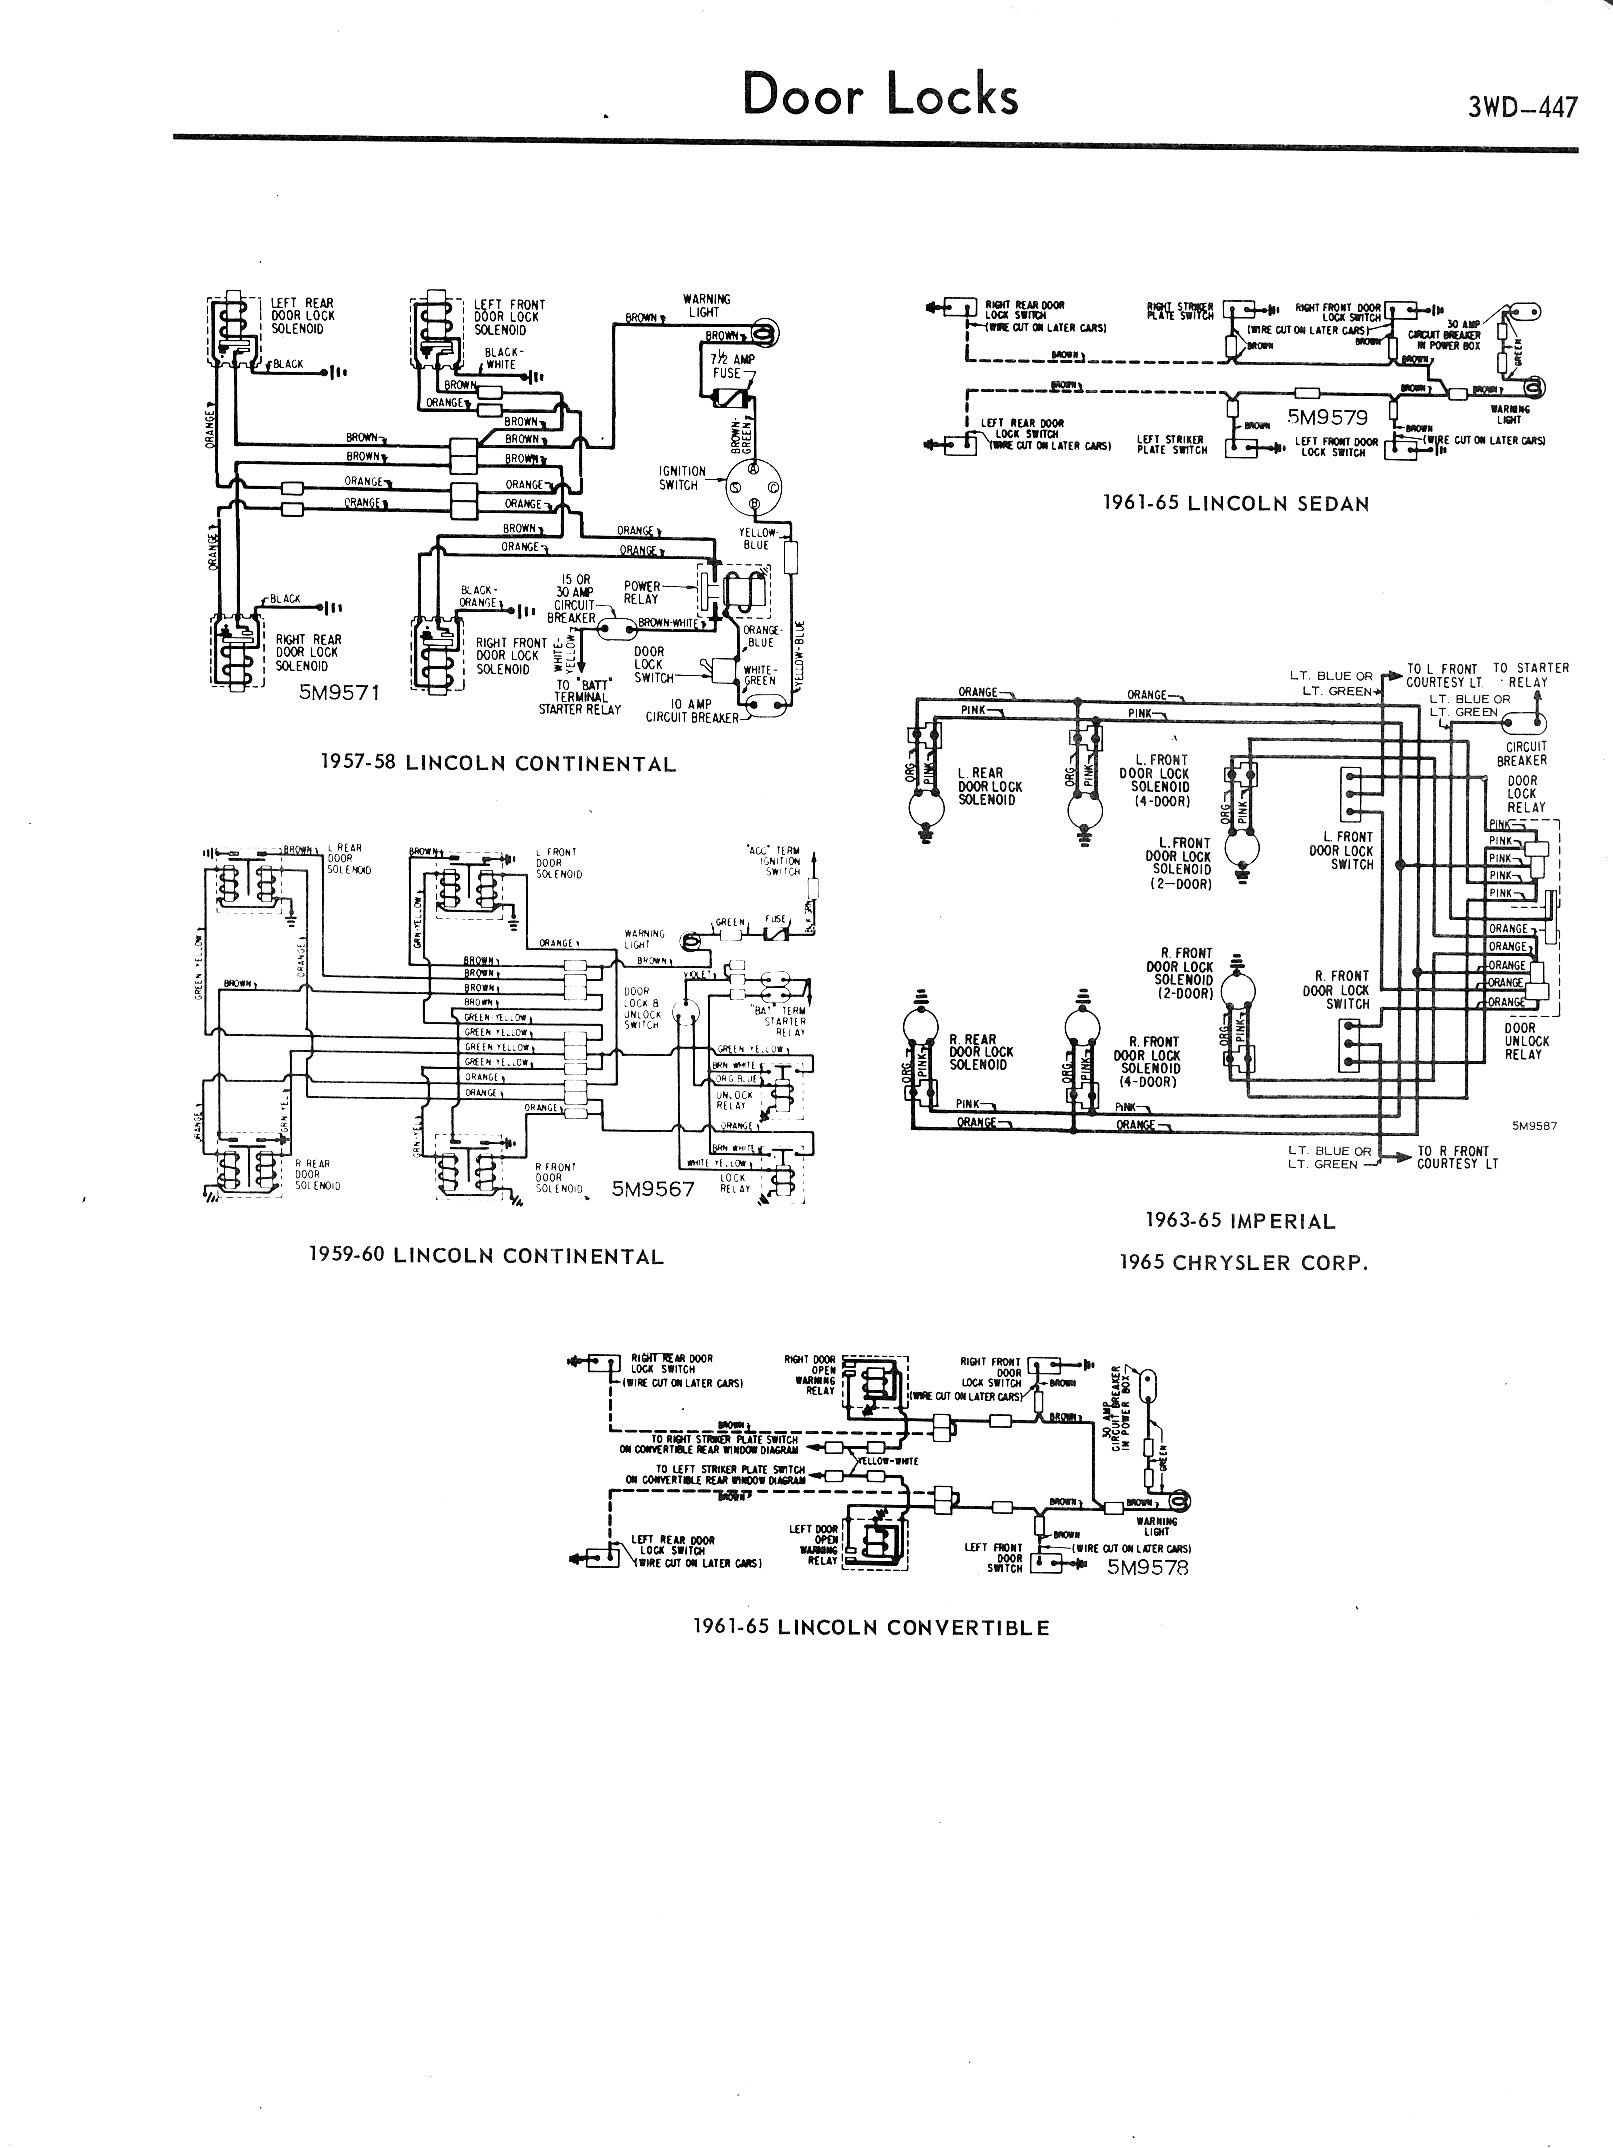 3WD 447_jpg 1957 1965 accessory wiring diagrams 3wd 447 jpg